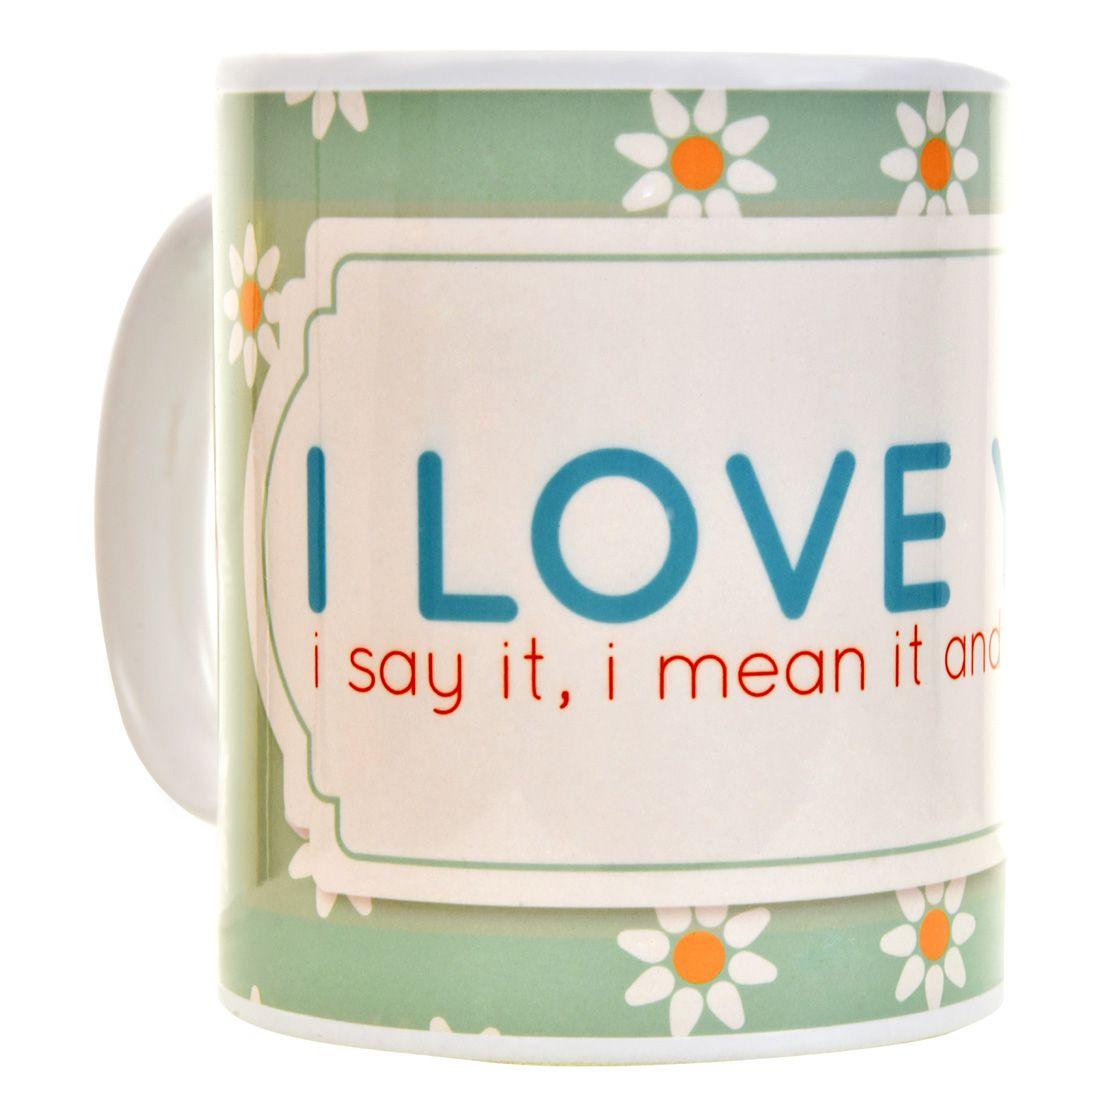 Halowishes Ceramic Coffee Mug 1 Pcs 325 ml